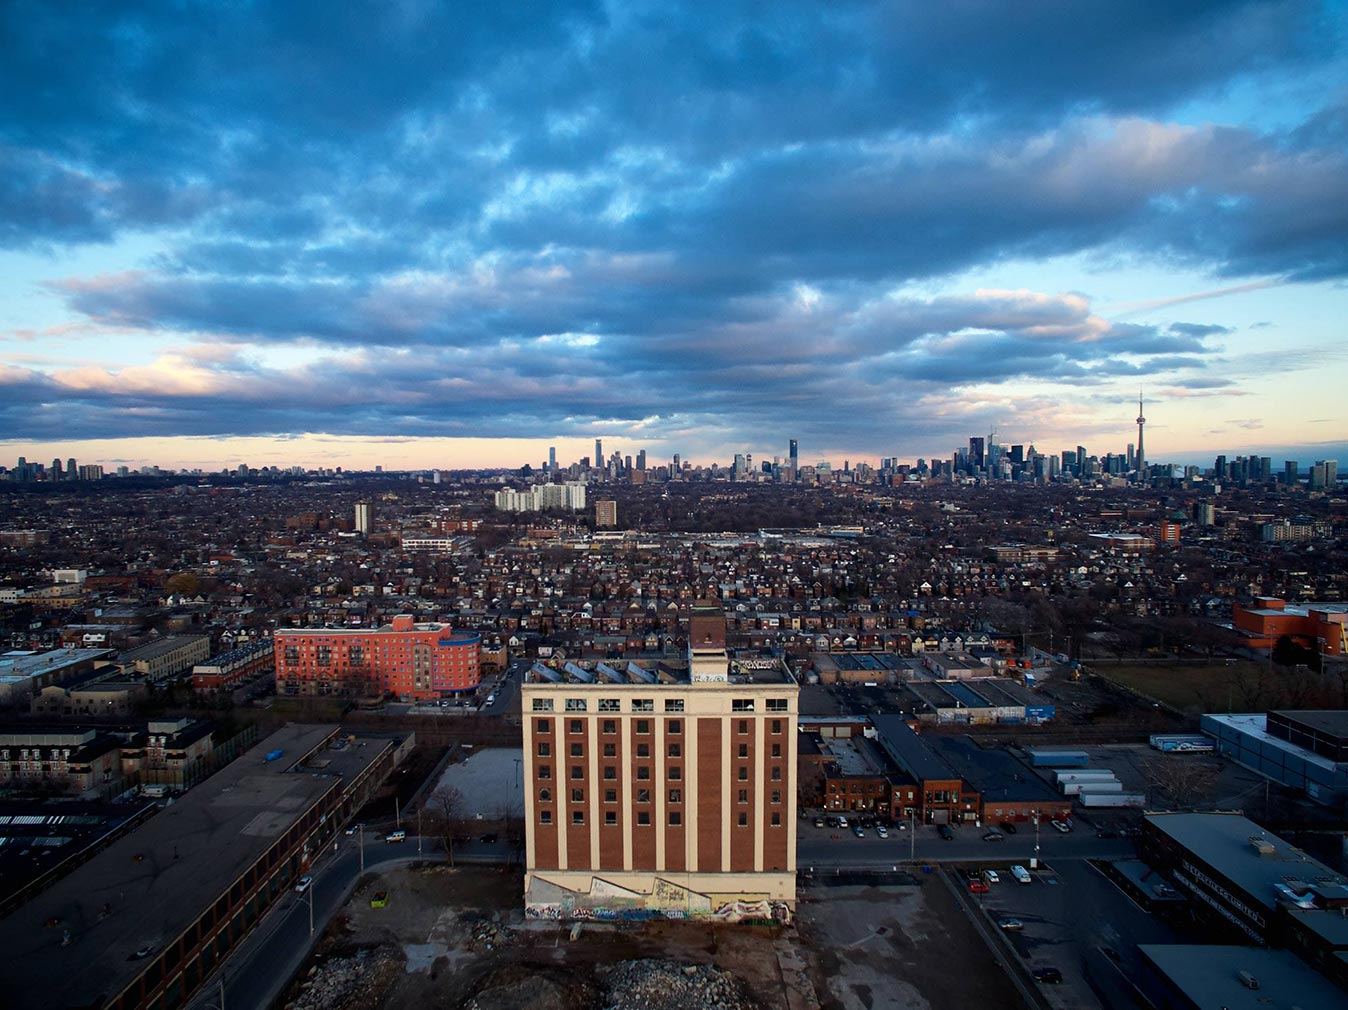 New Museum of Contemporary Art Toronto